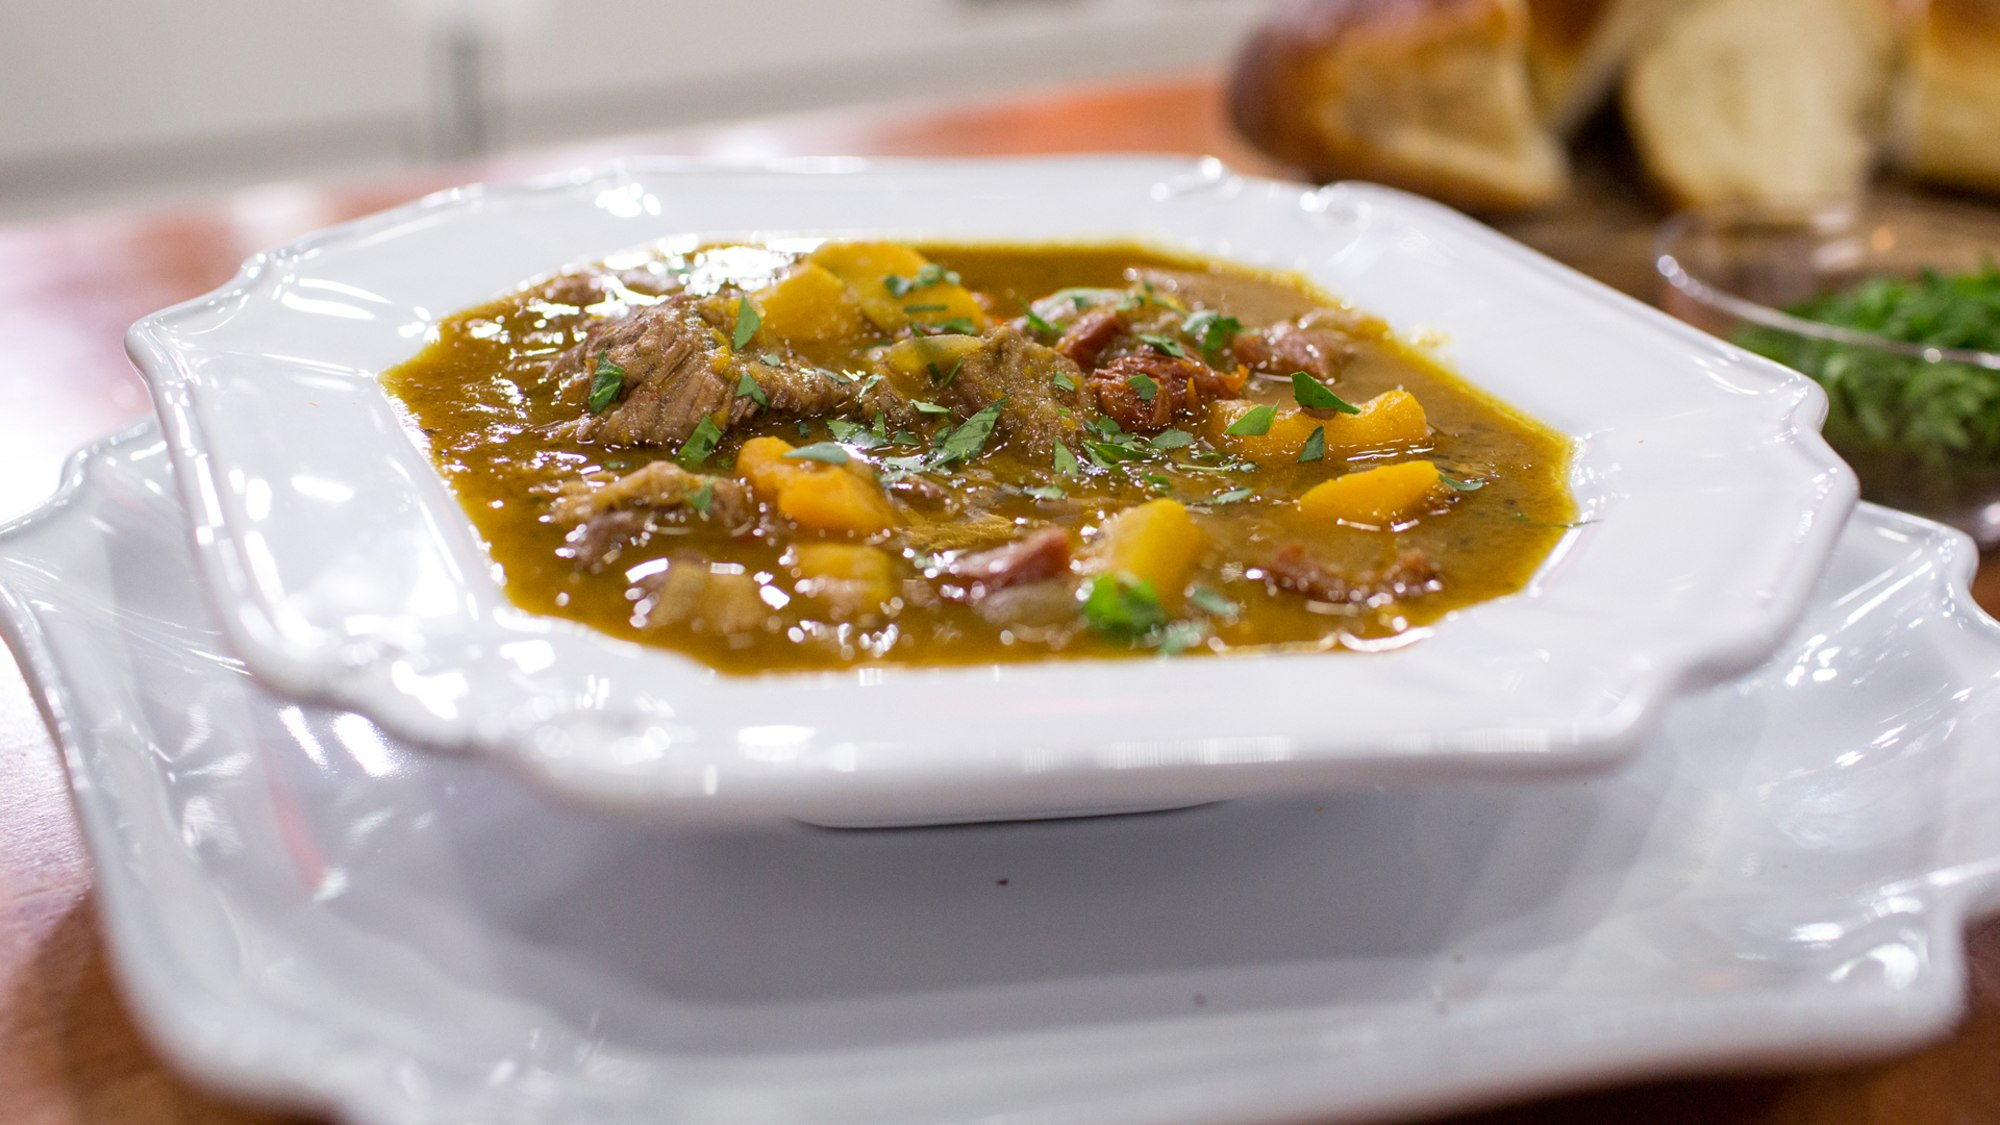 Crockpot Beef & Squash Stew